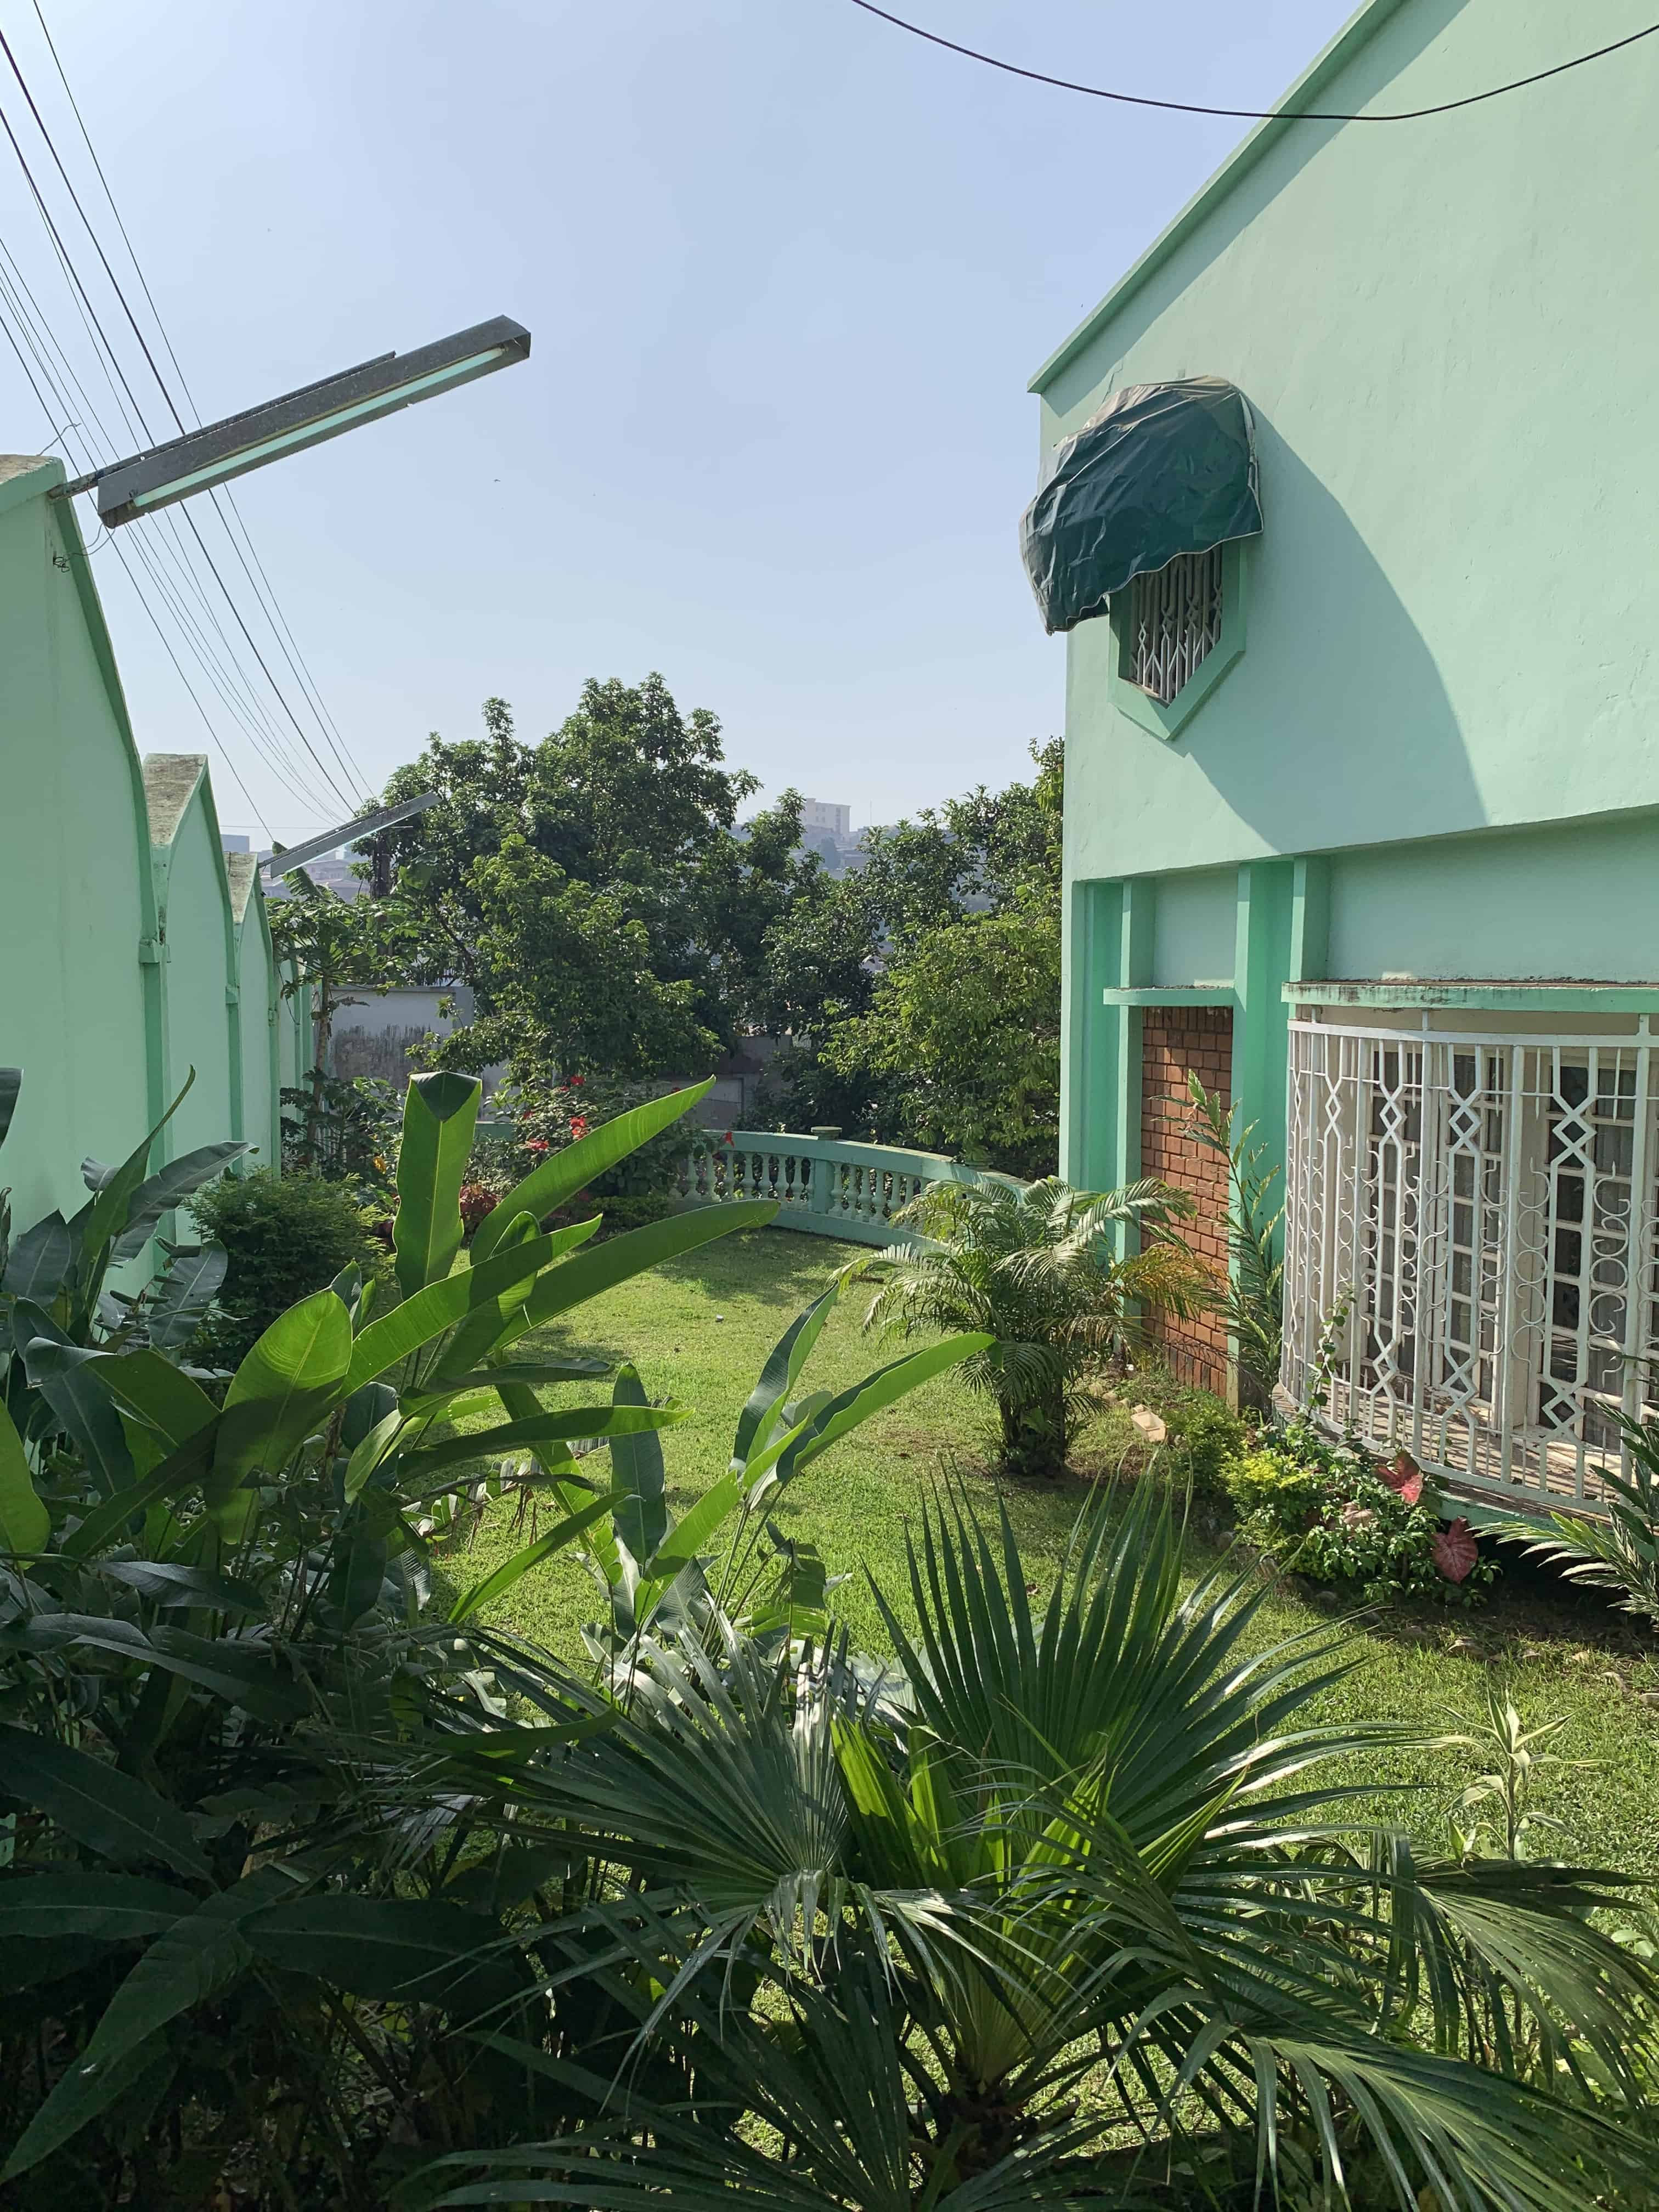 House (Villa) to rent - Yaoundé, Mfandena, Omnisports - 1 living room(s), 4 bedroom(s), 3 bathroom(s) - 1 000 000 FCFA / month